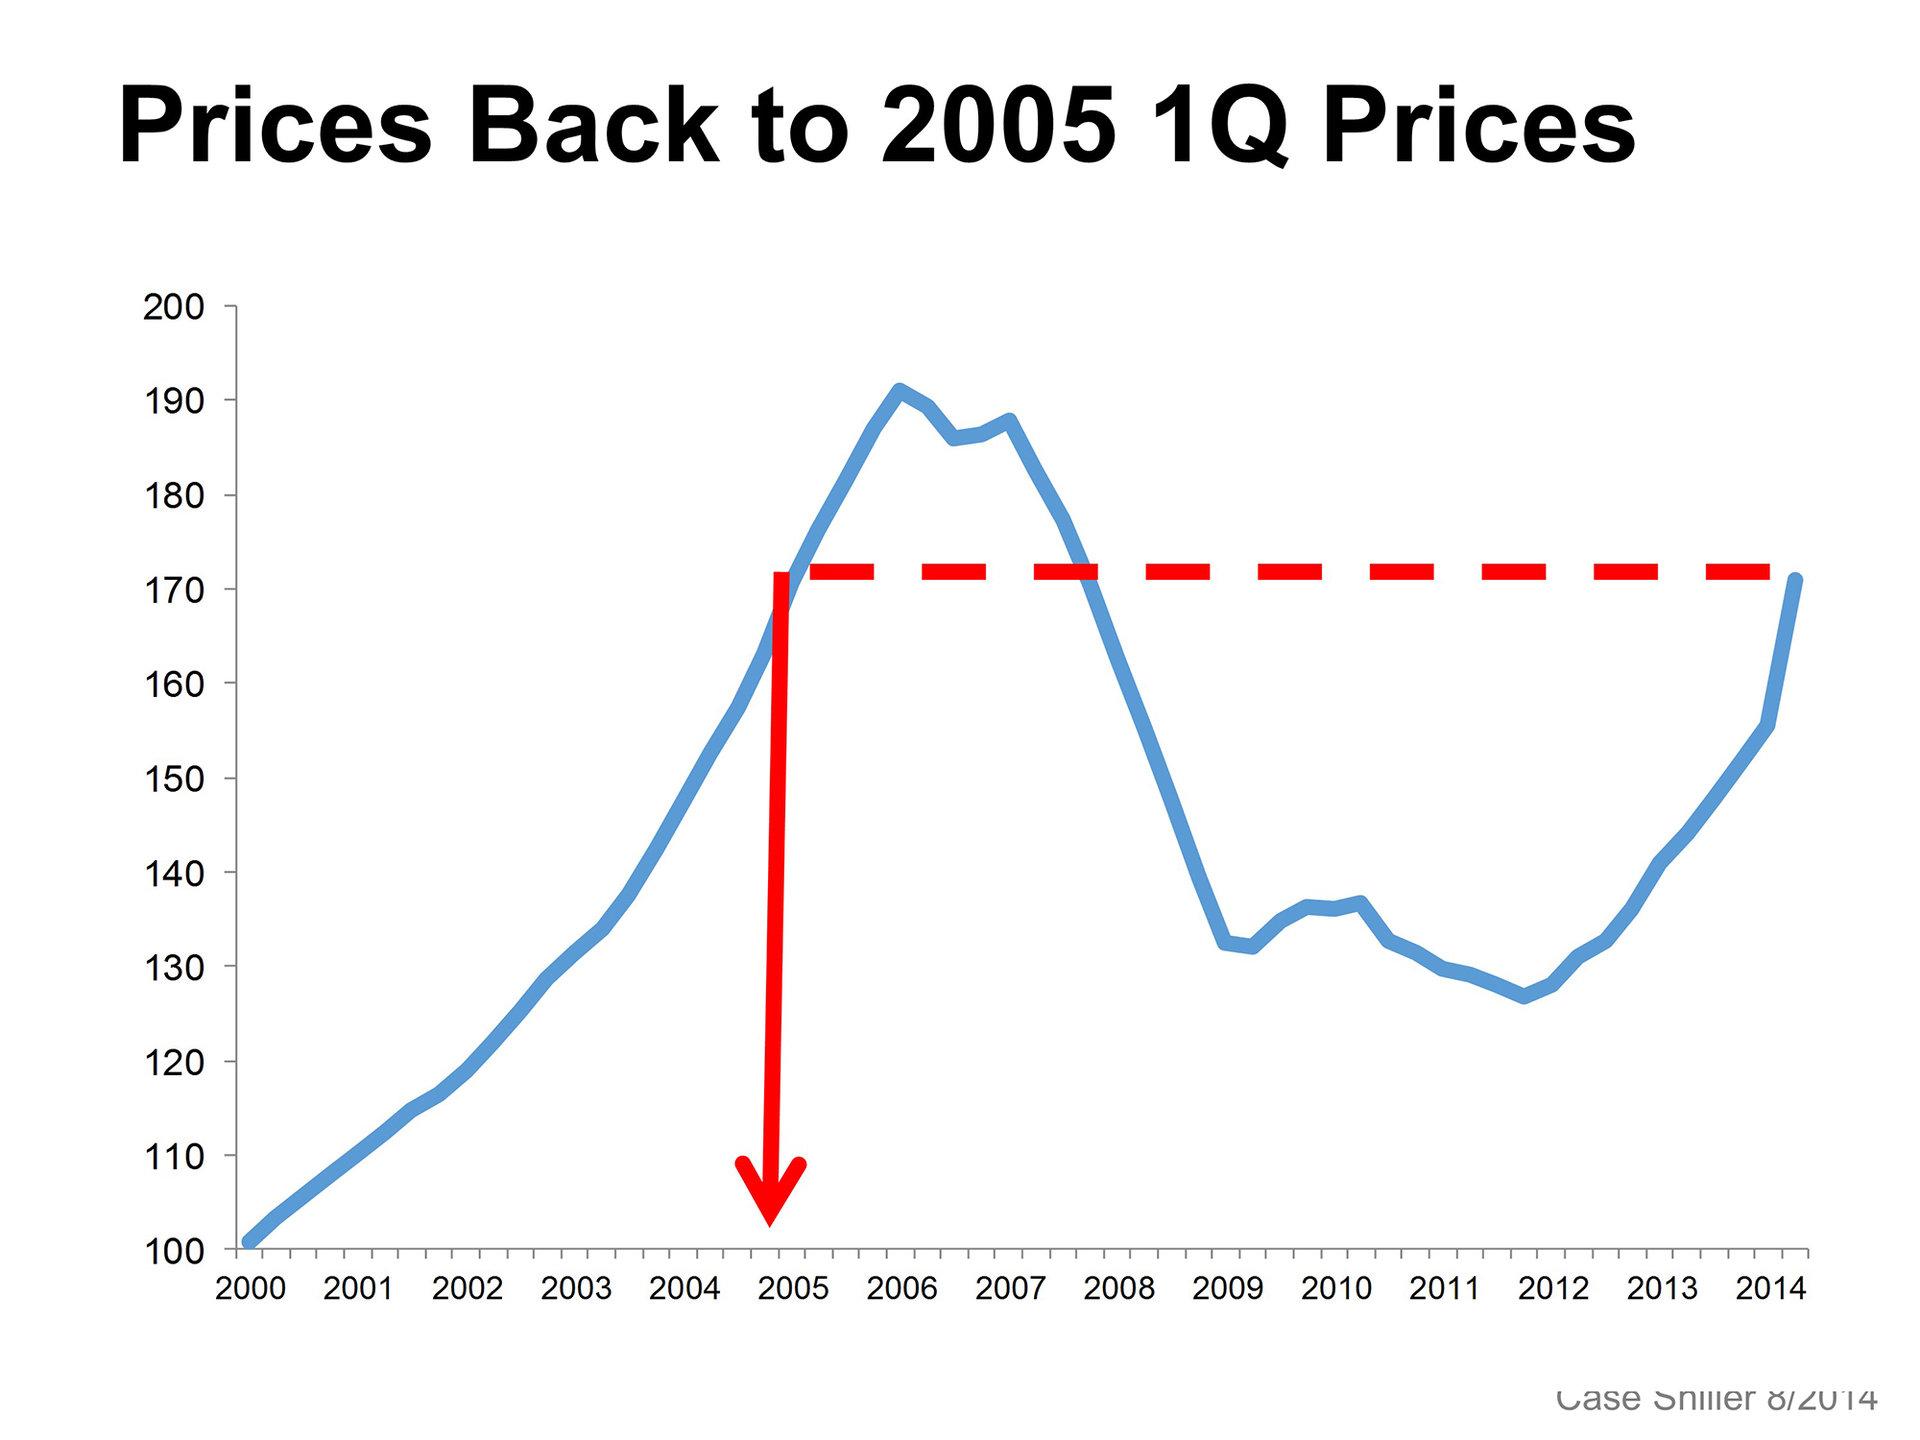 Prices Return to 2005 Average